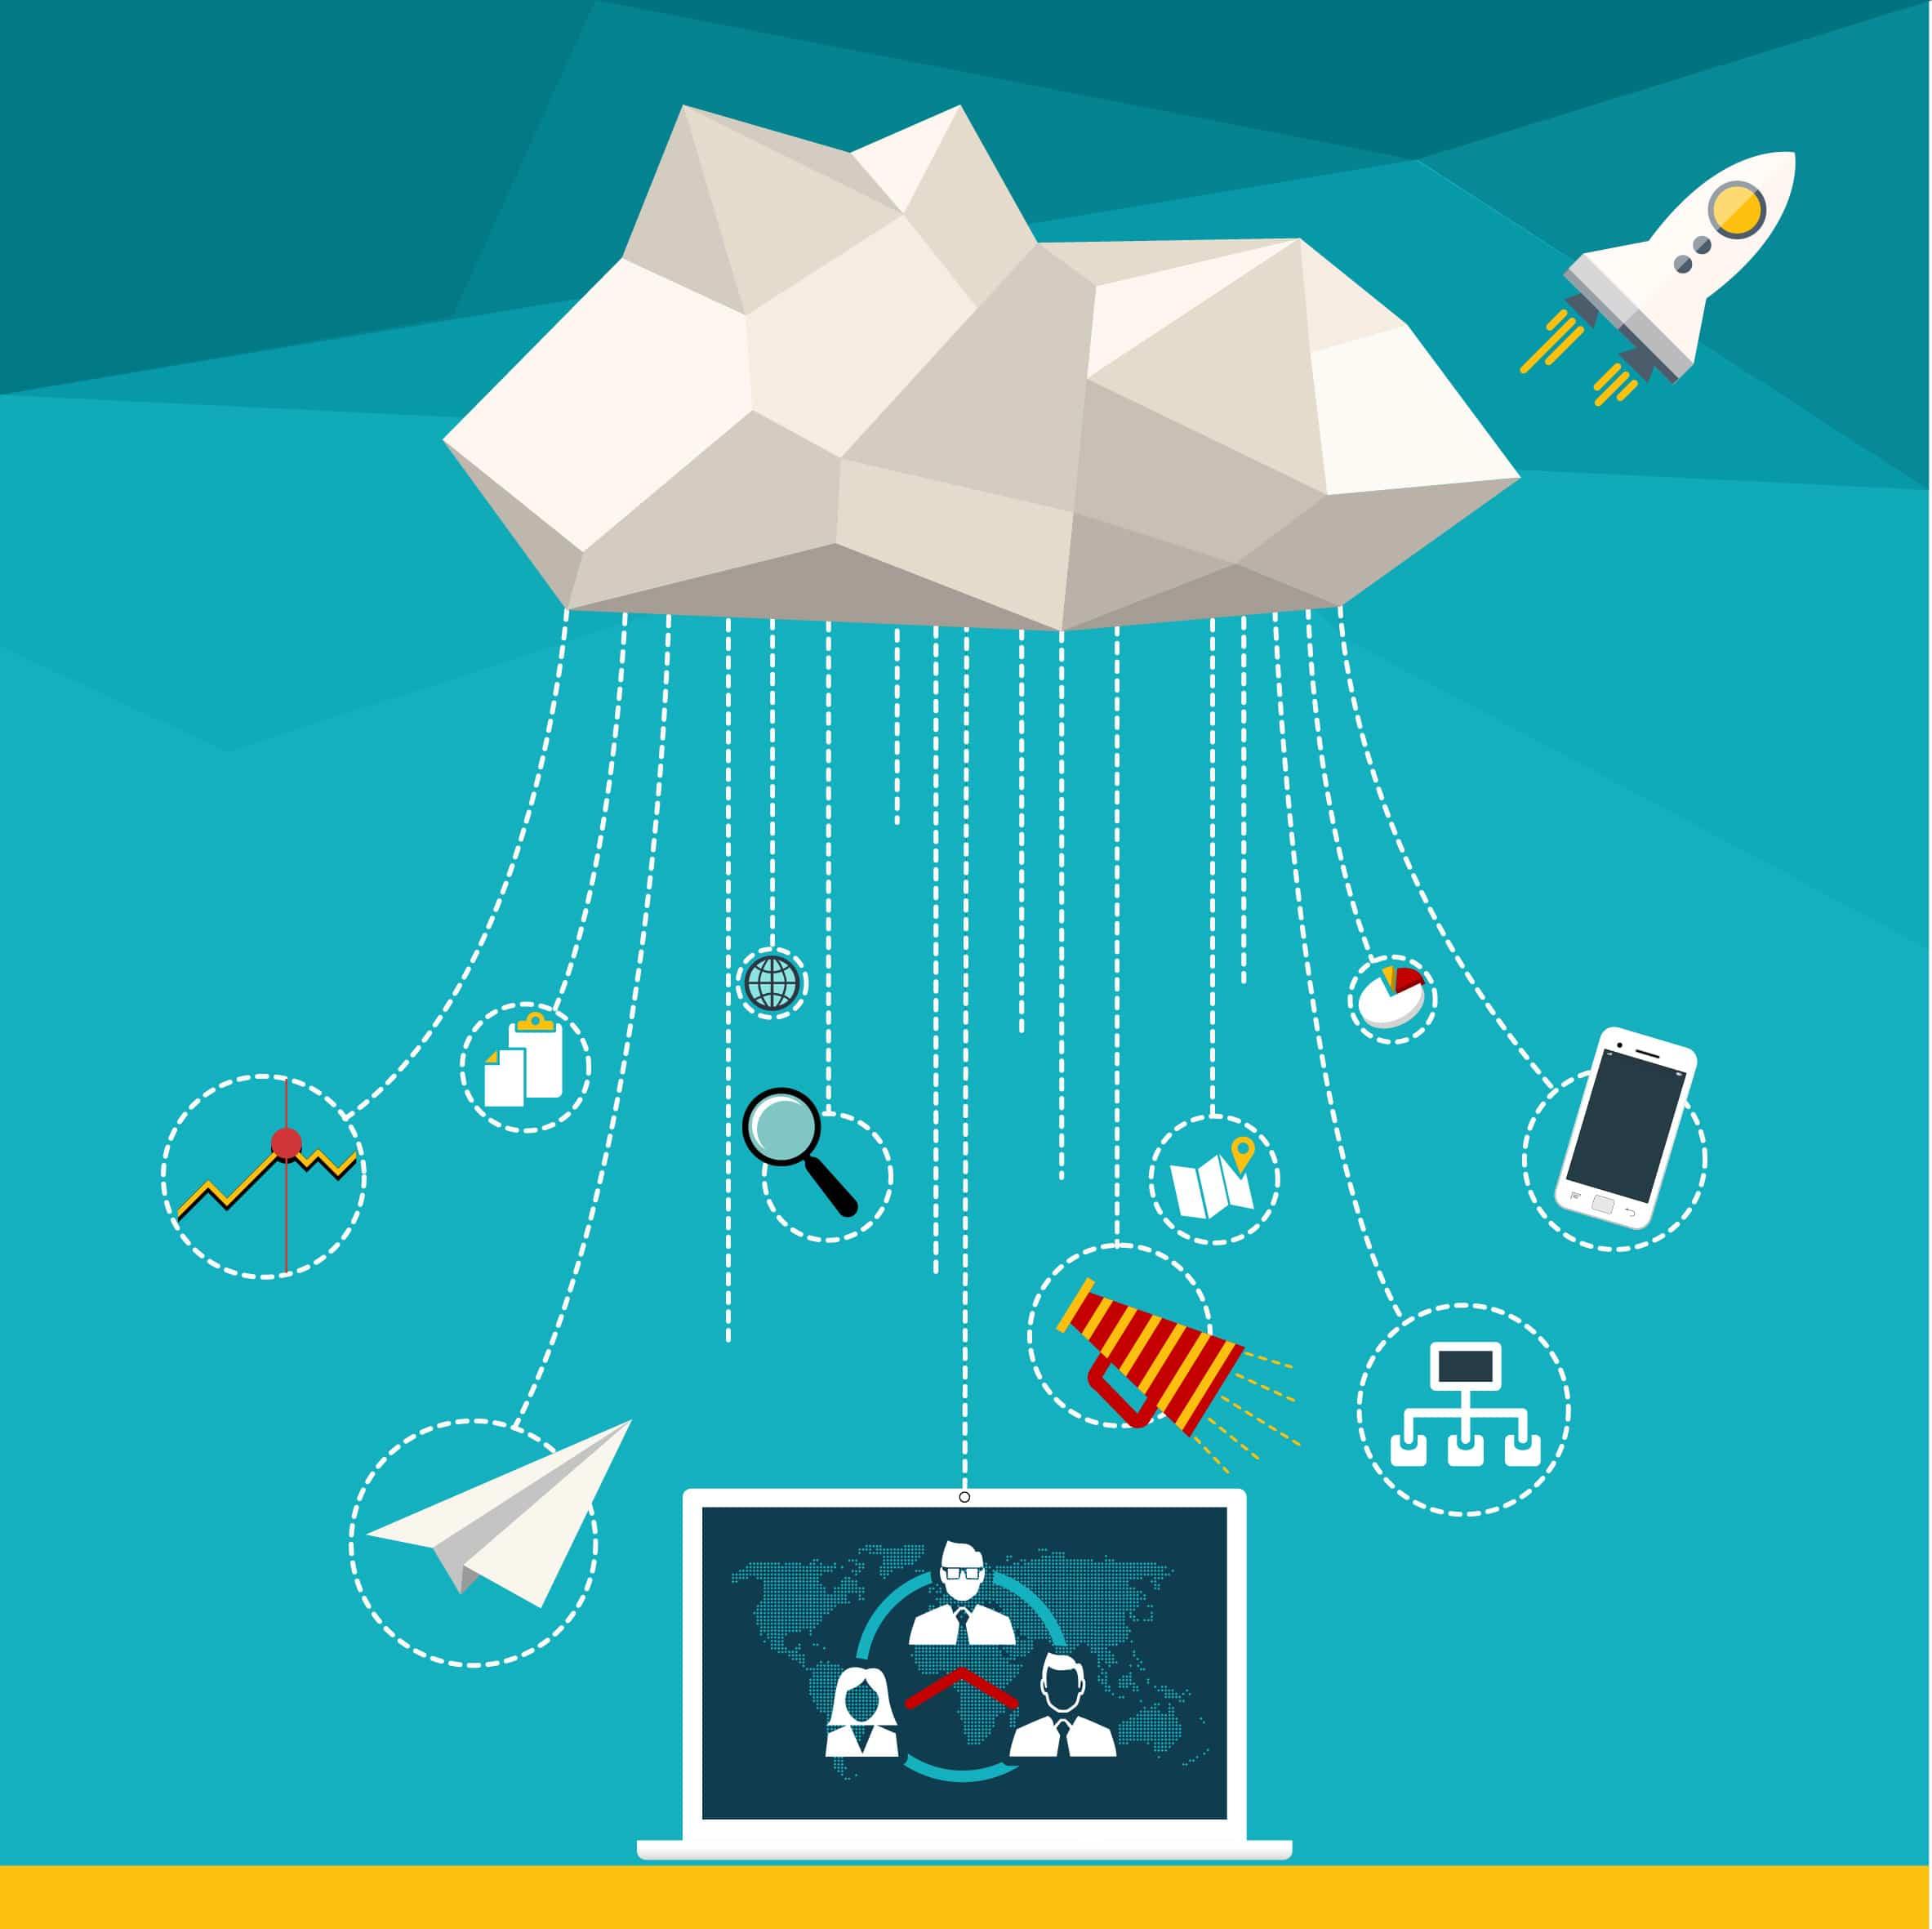 cloud computing ilustracion a cloud hosting